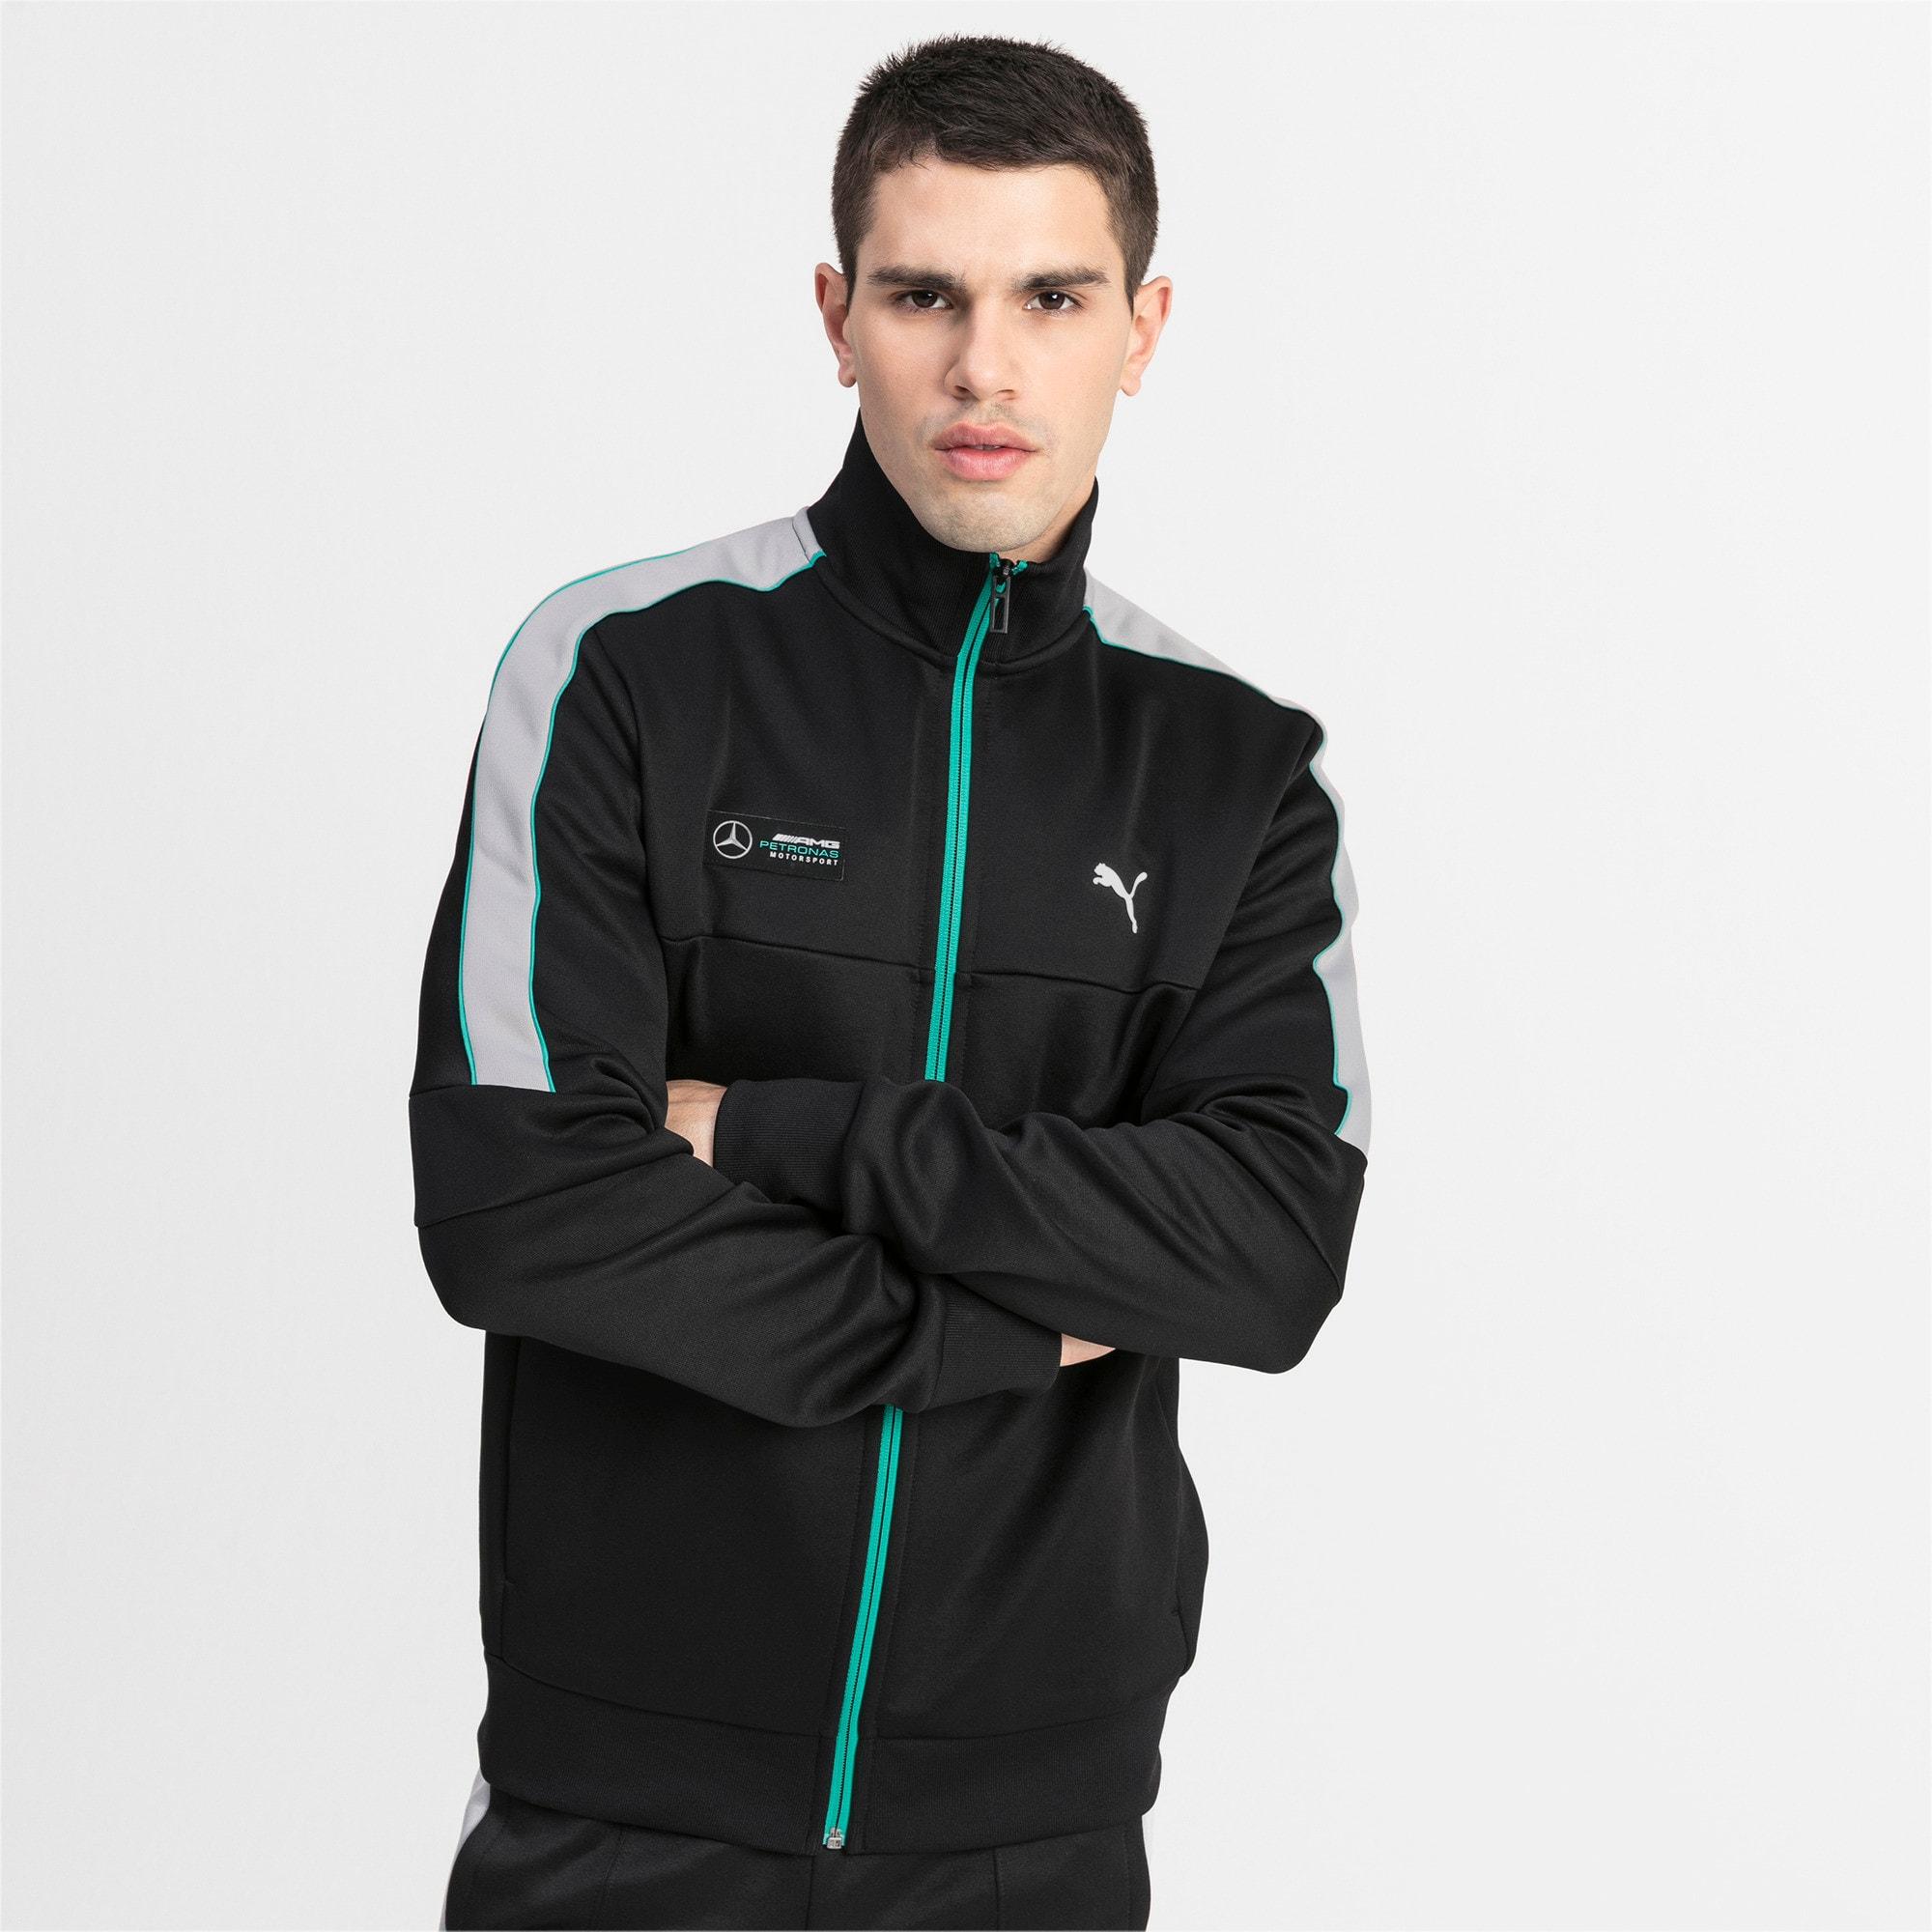 Thumbnail 1 of MAPM T7 Men's Track Jacket, Puma Black, medium